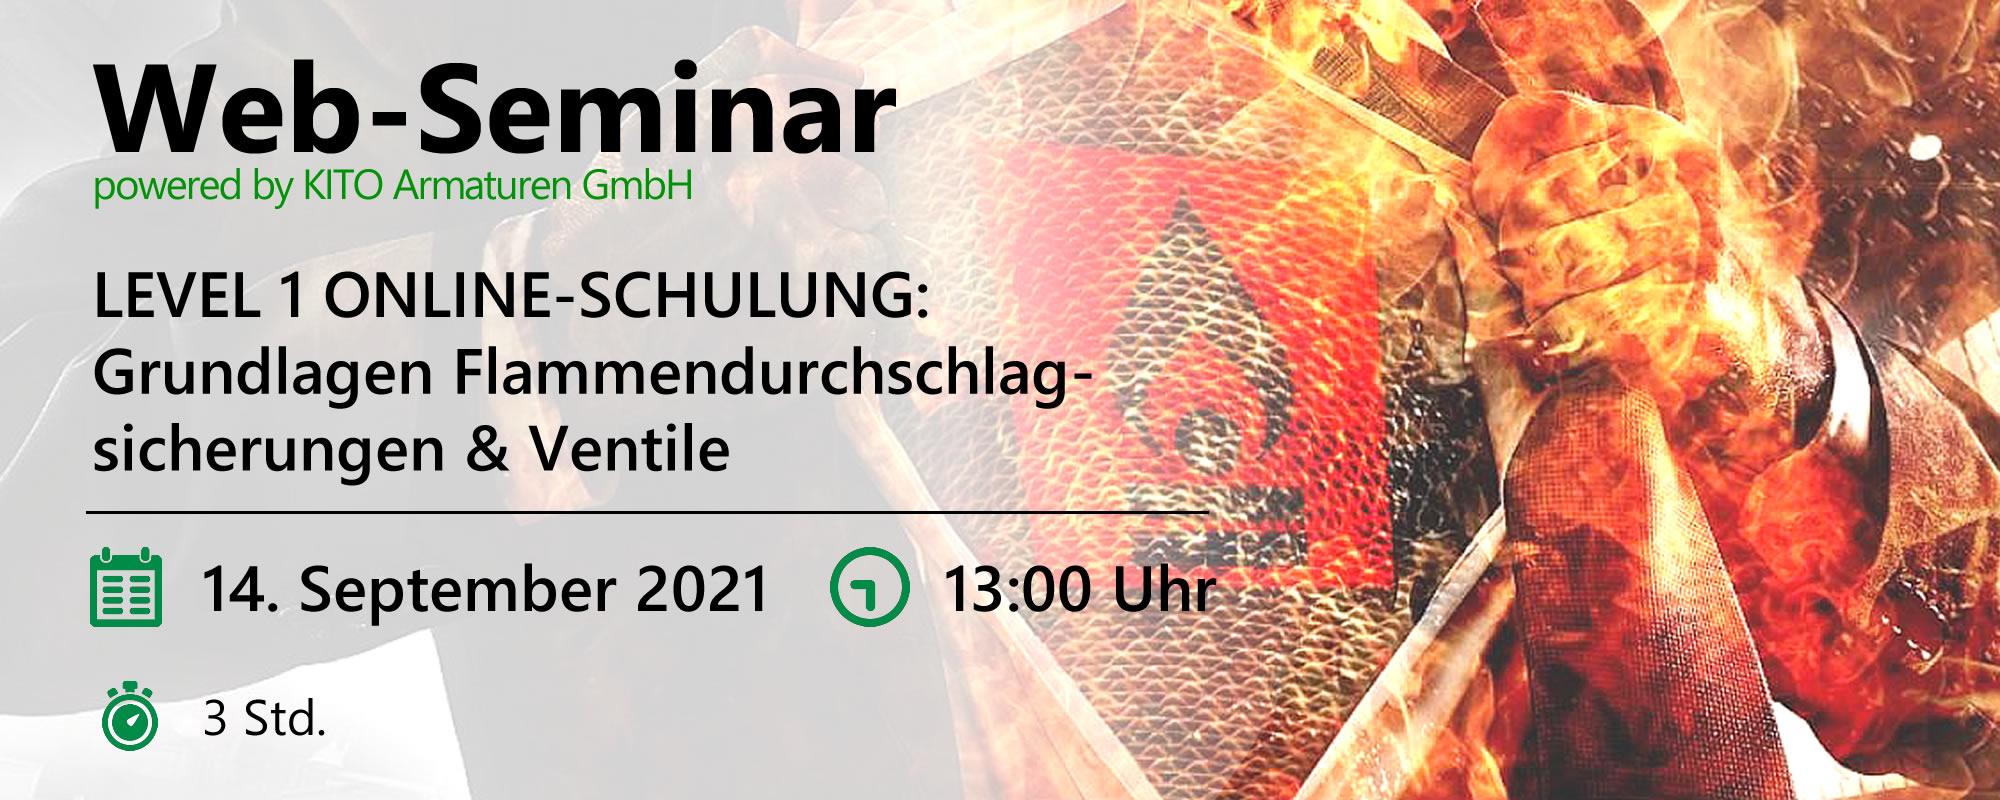 Web-Seminar am 14.09.2021